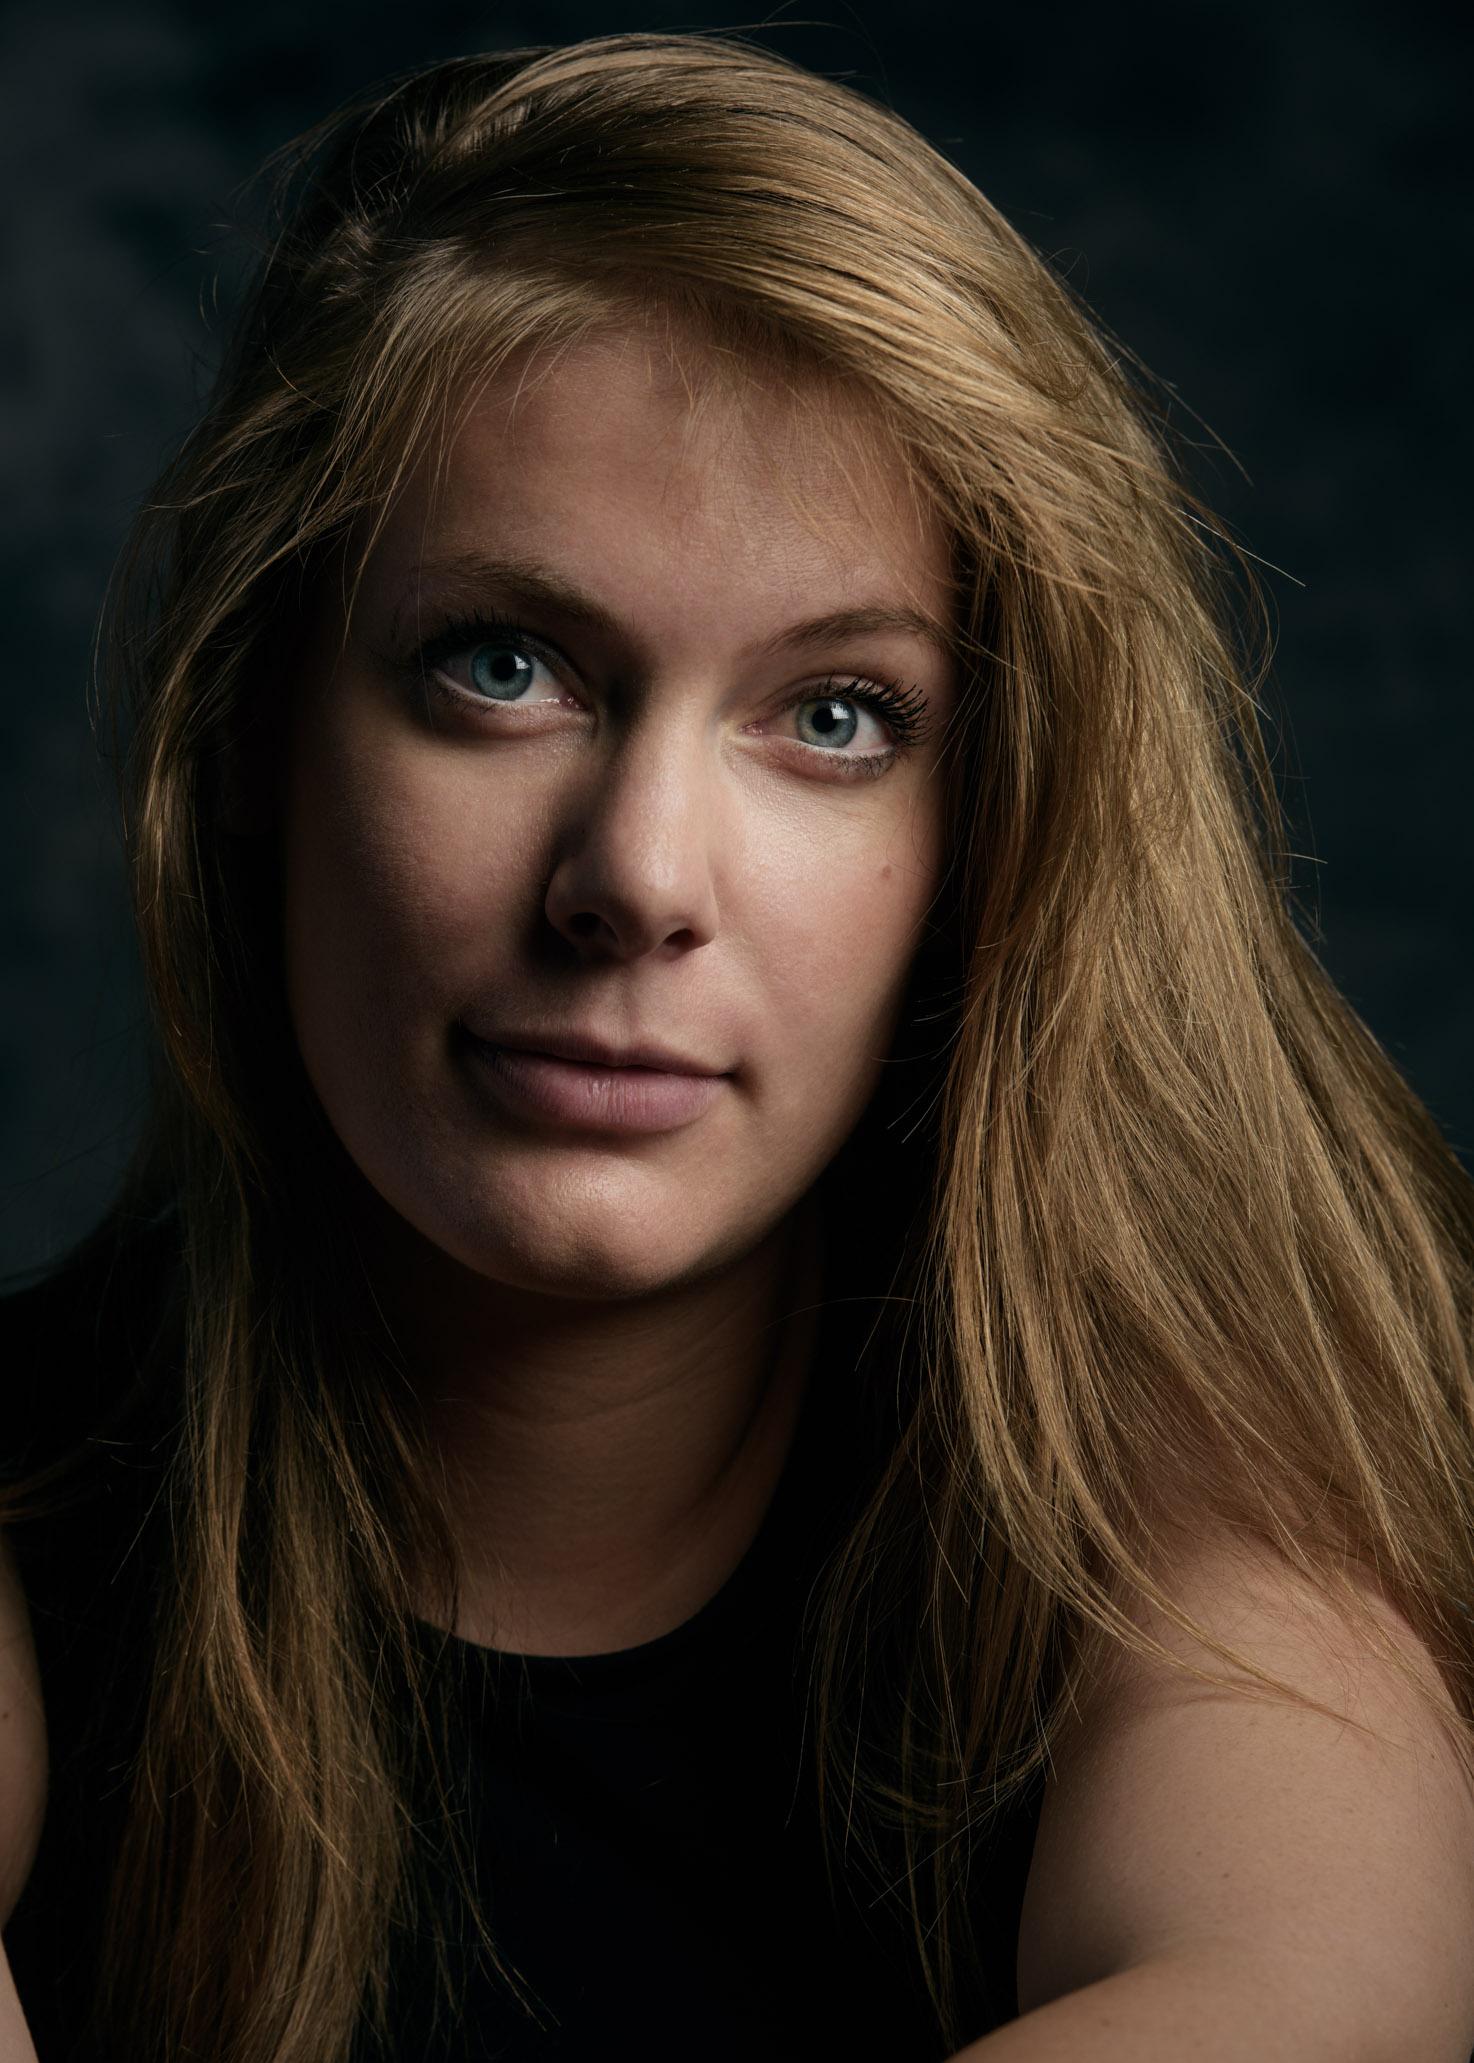 PortraitAlexandra-web-4.jpg